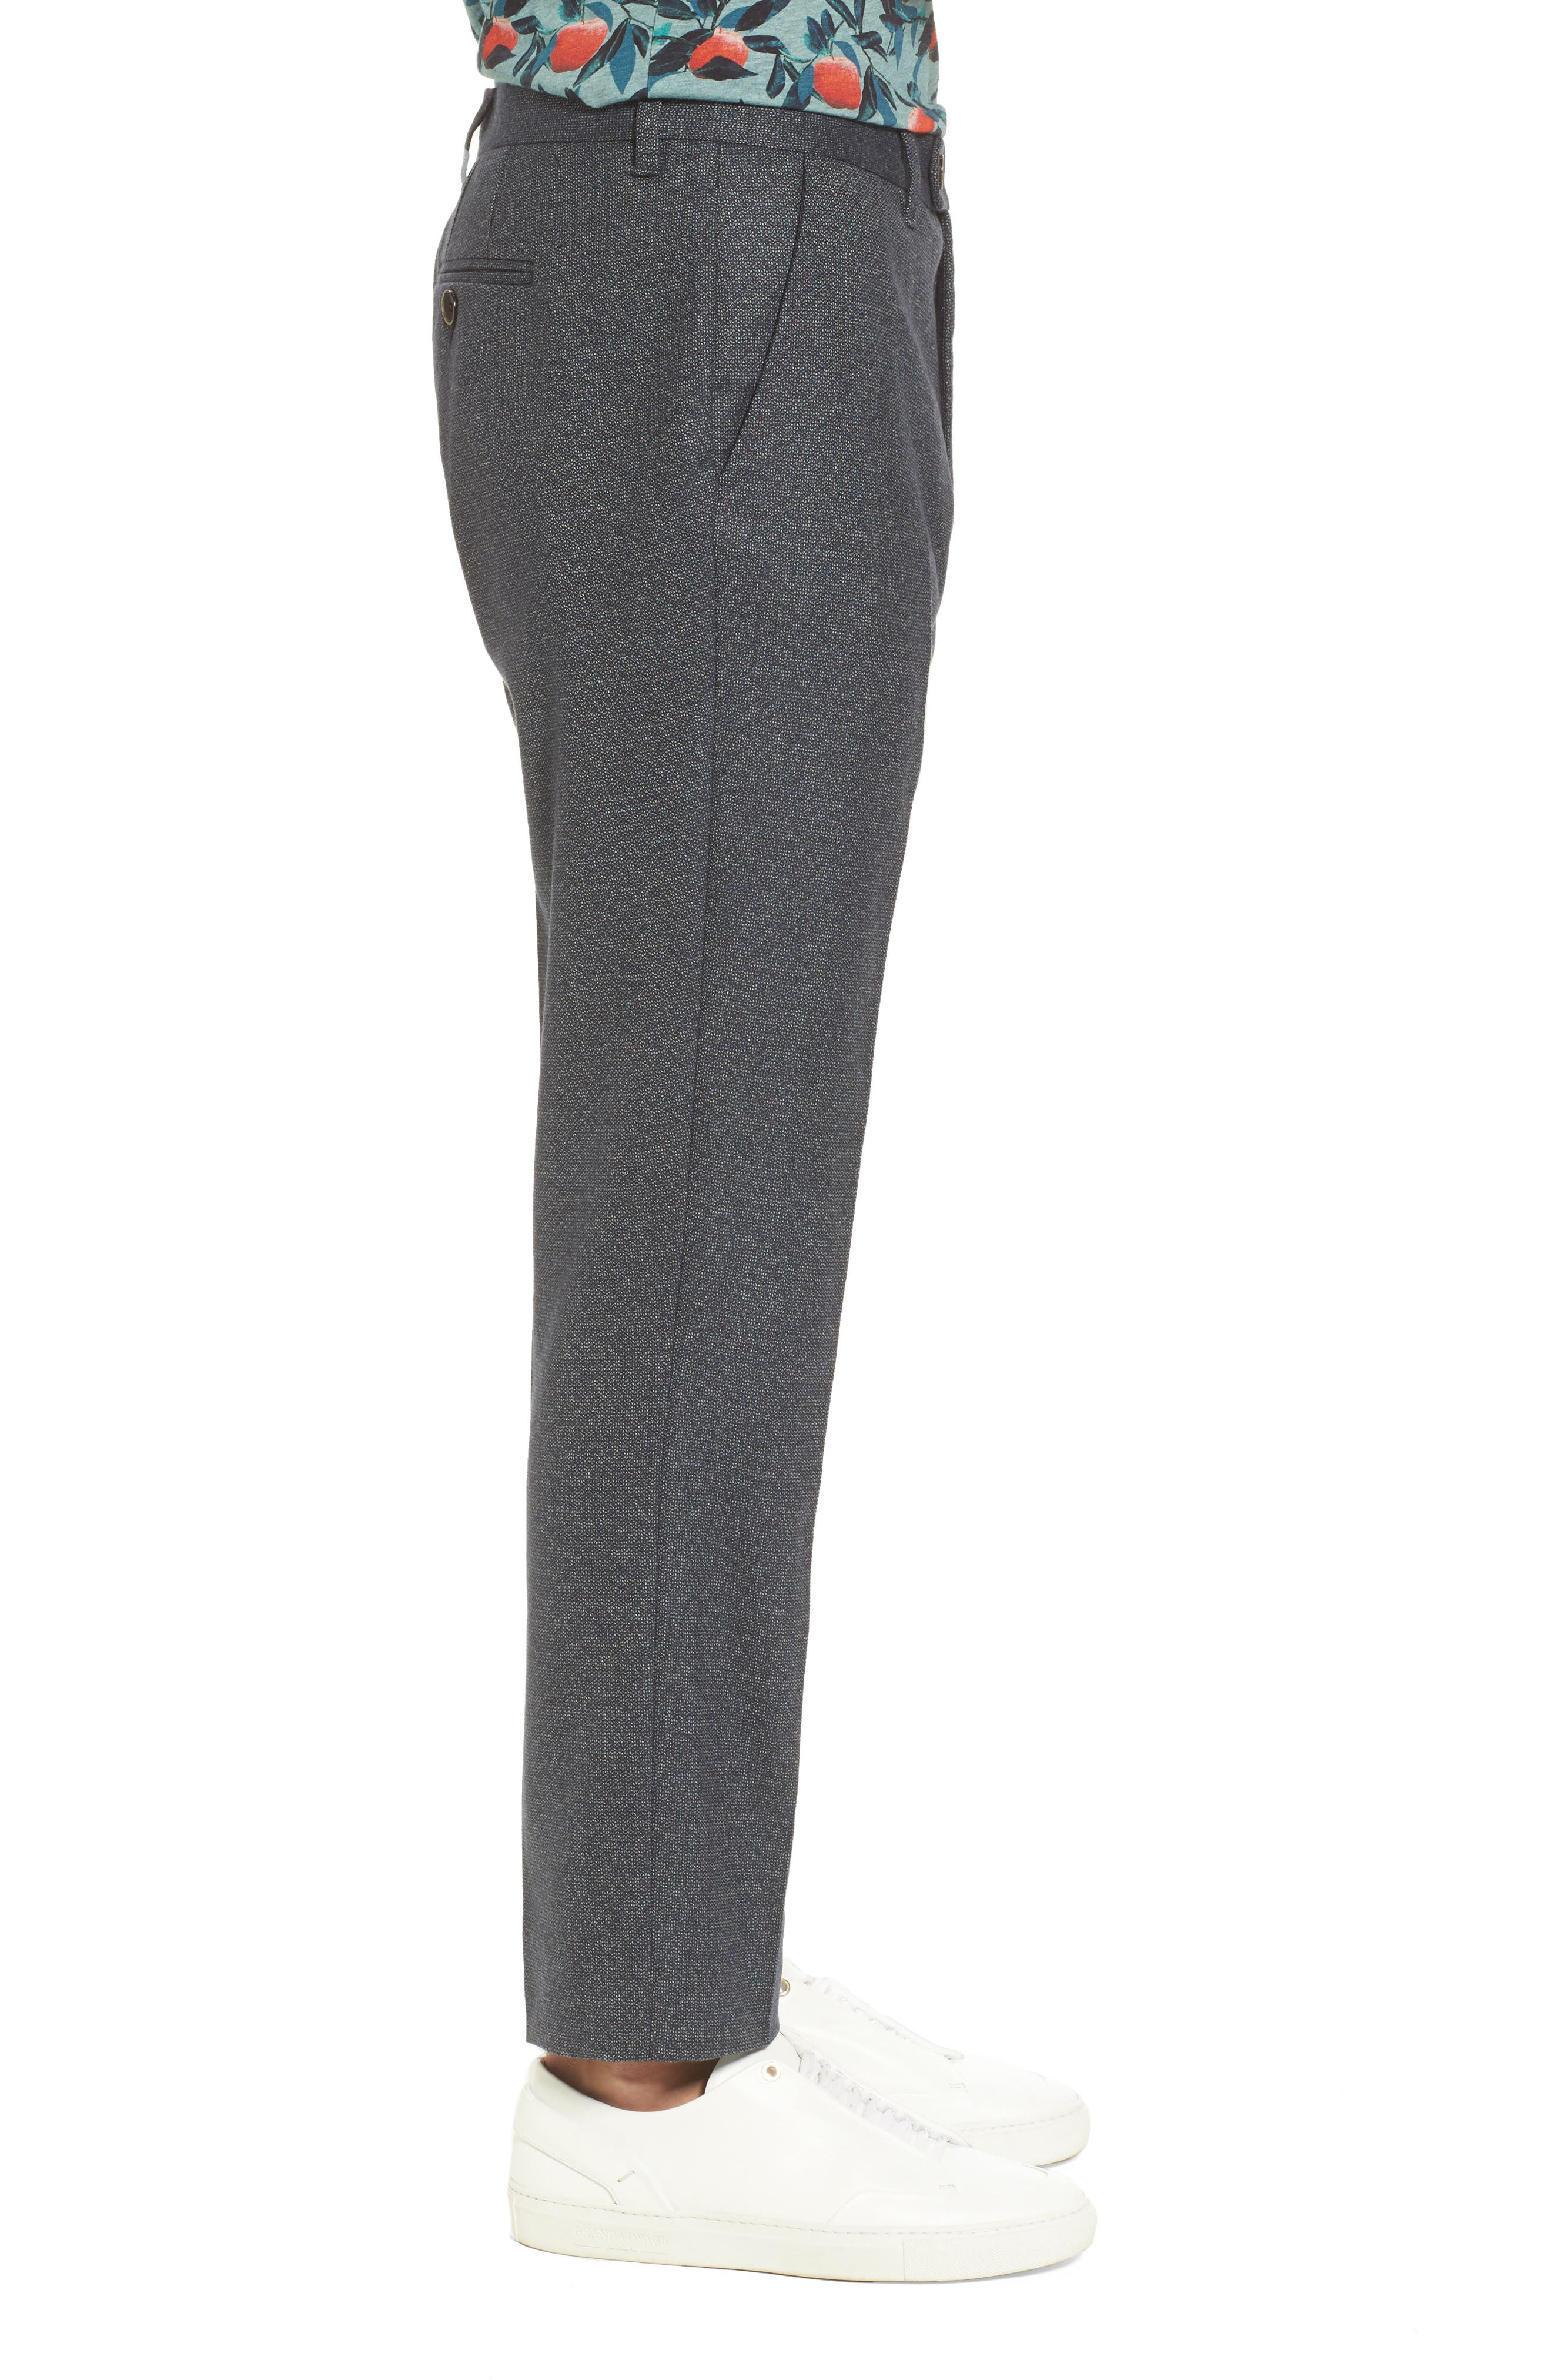 Beektro Trim Fit Trousers,                             Alternate thumbnail 3, color,